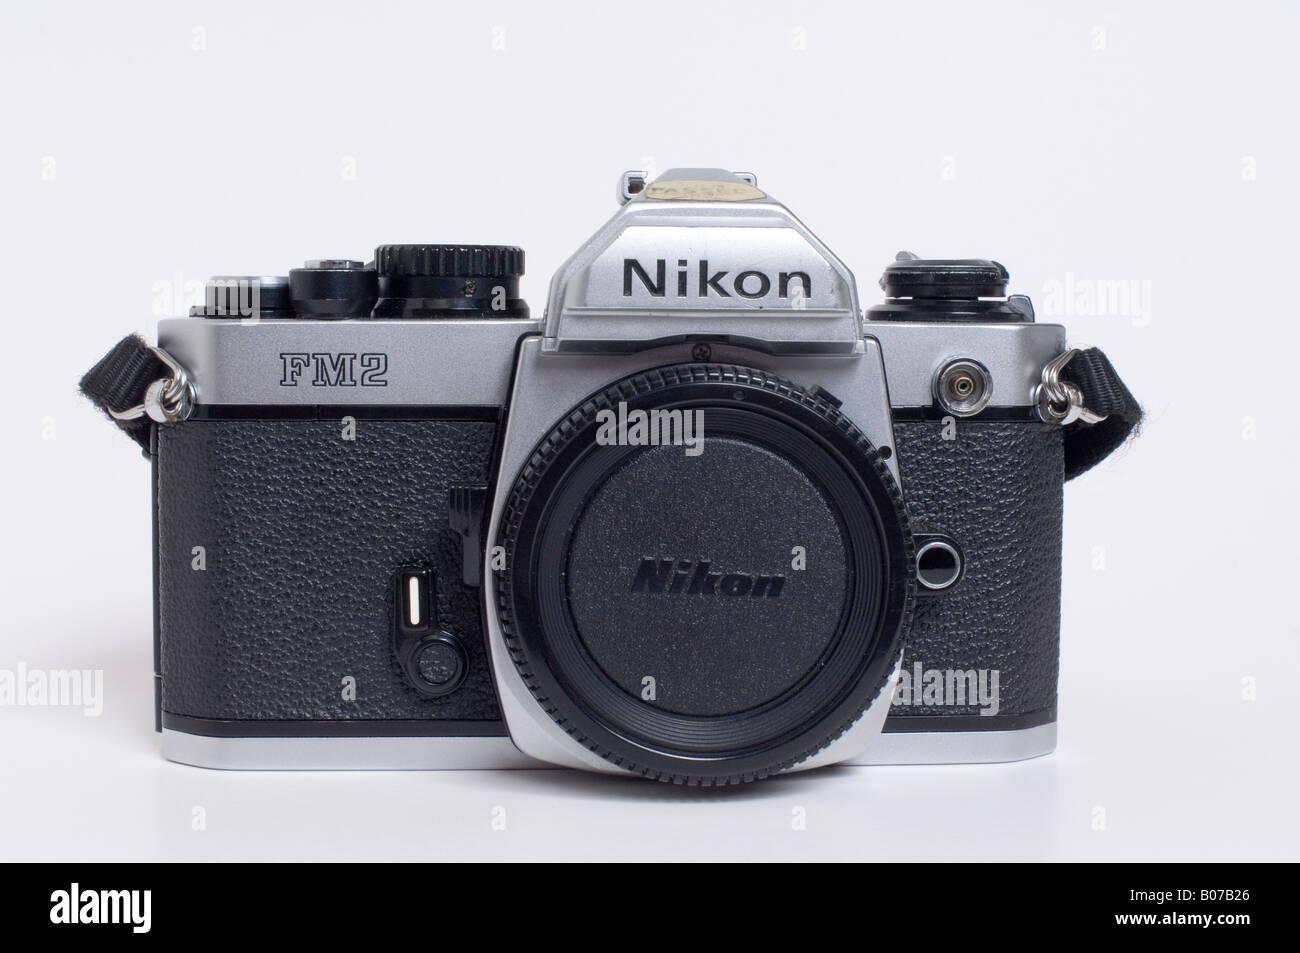 Nikon FM2 Slr 35mm Film Camera - Stock Image